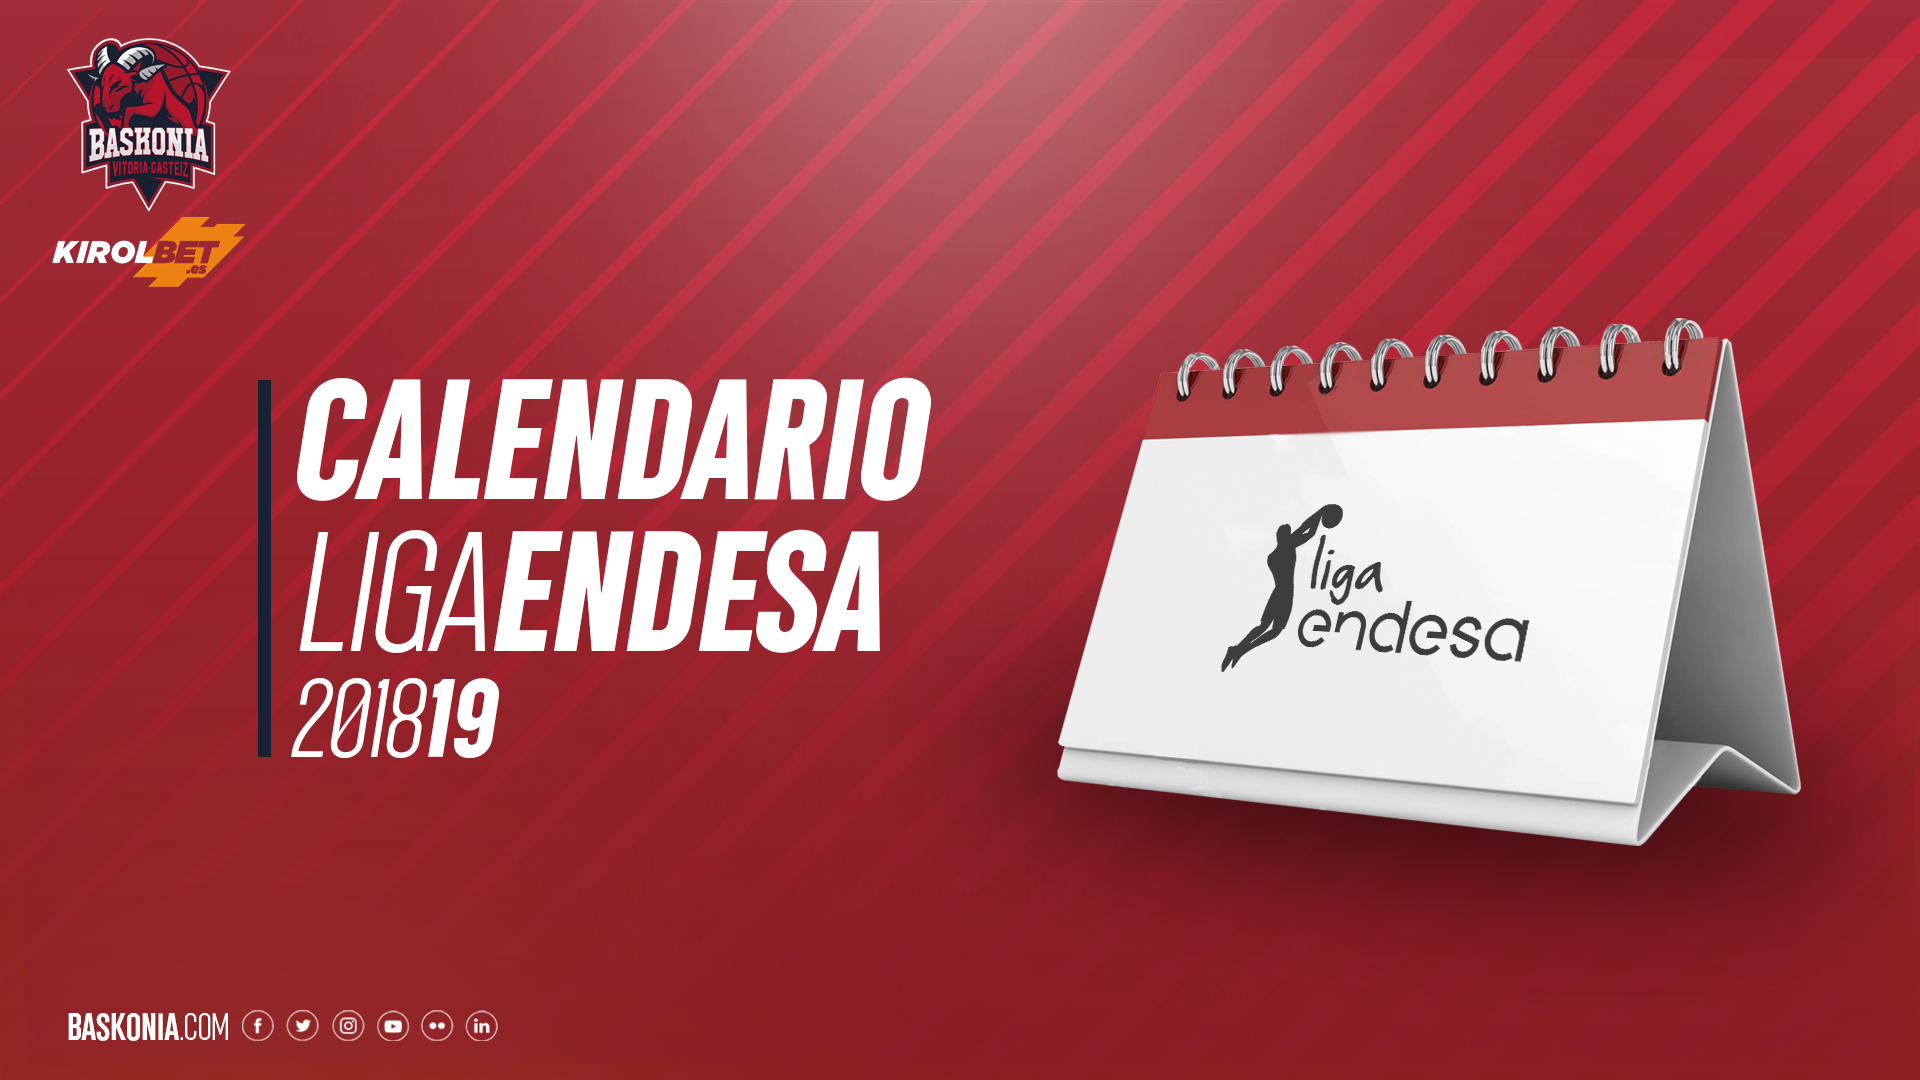 Calendario Tecnyconta.Calendario 2018 2019 De La Liga Endesa Saski Baskonia